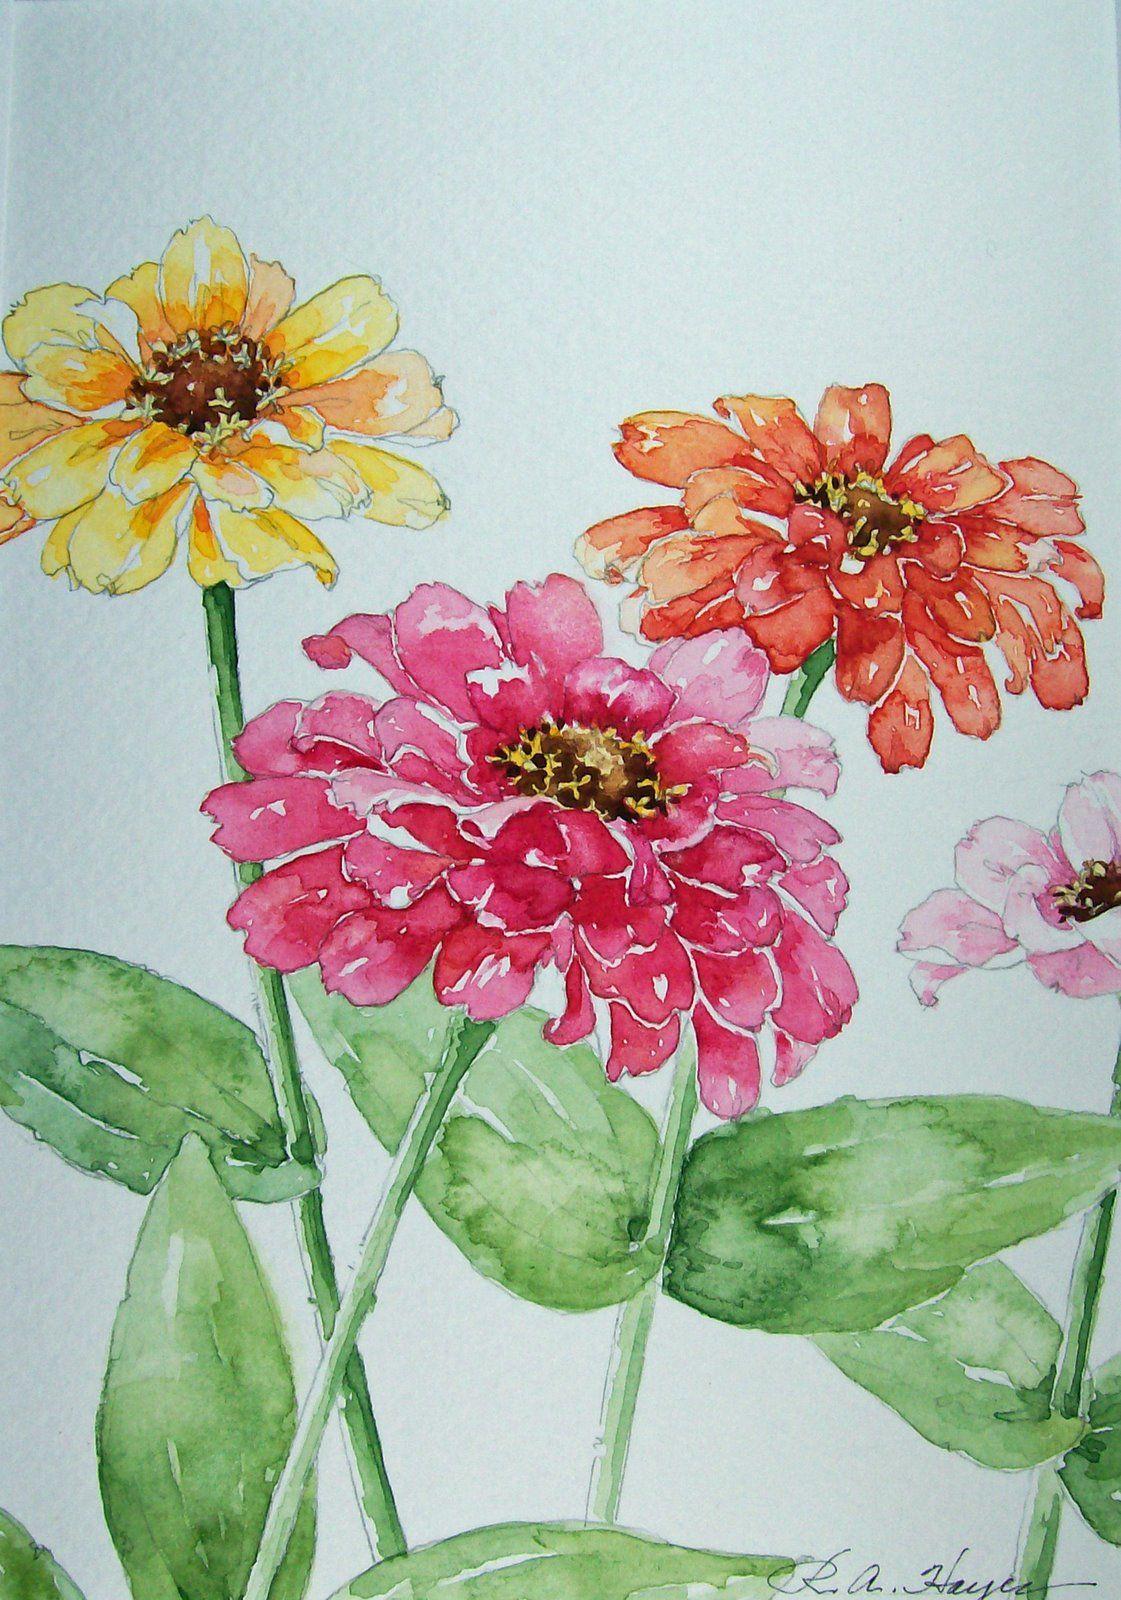 Daily Watercolors: ZINNIAS WATERCOLOR PAINTING   tutorials ...